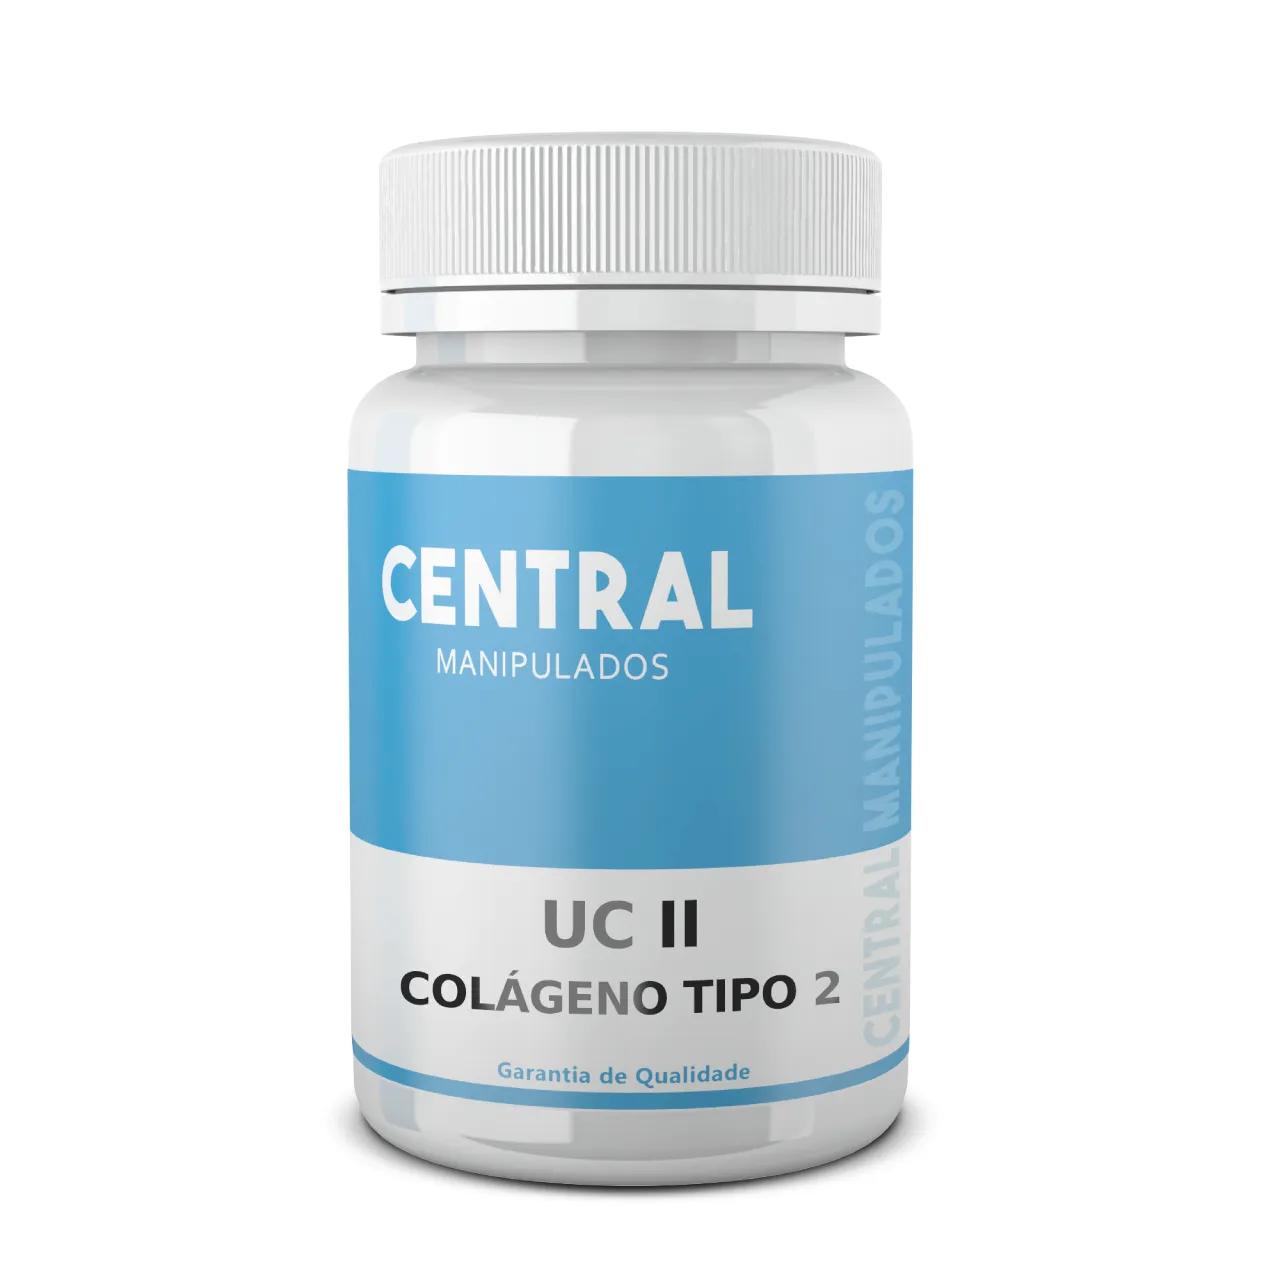 UC-II 40MG Colágeno Tipo II - 120 cápsulas  - Dores Articulares, Ósseas e das Cartilagens